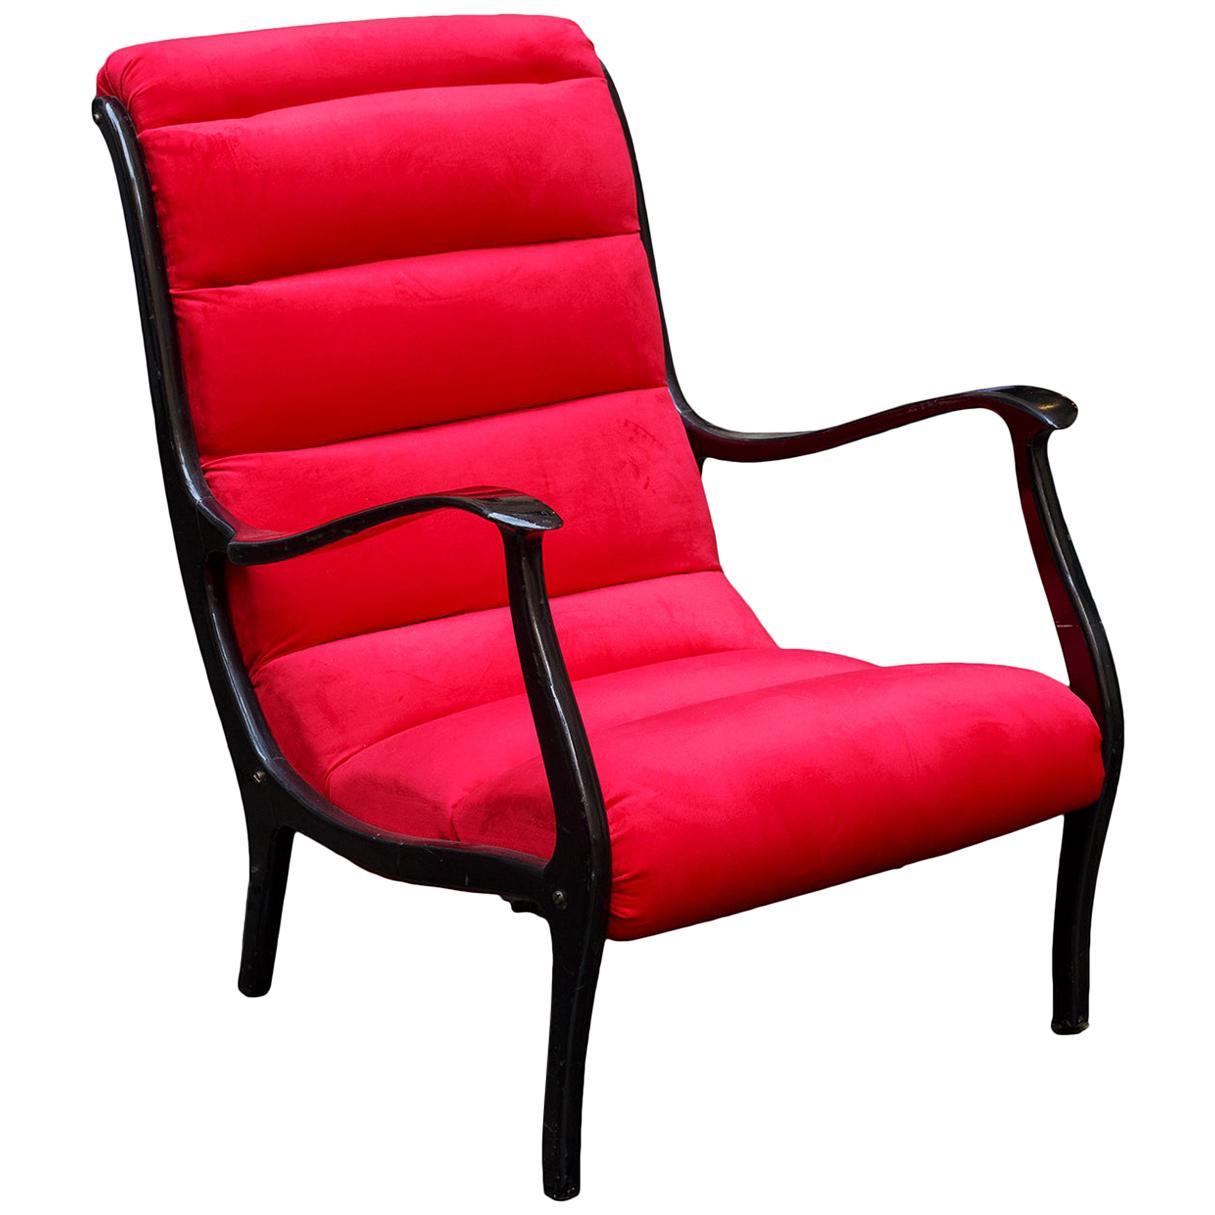 Ezio Longhi Red Velvet Armchair Mid-Century Modern, Italy, 1950s